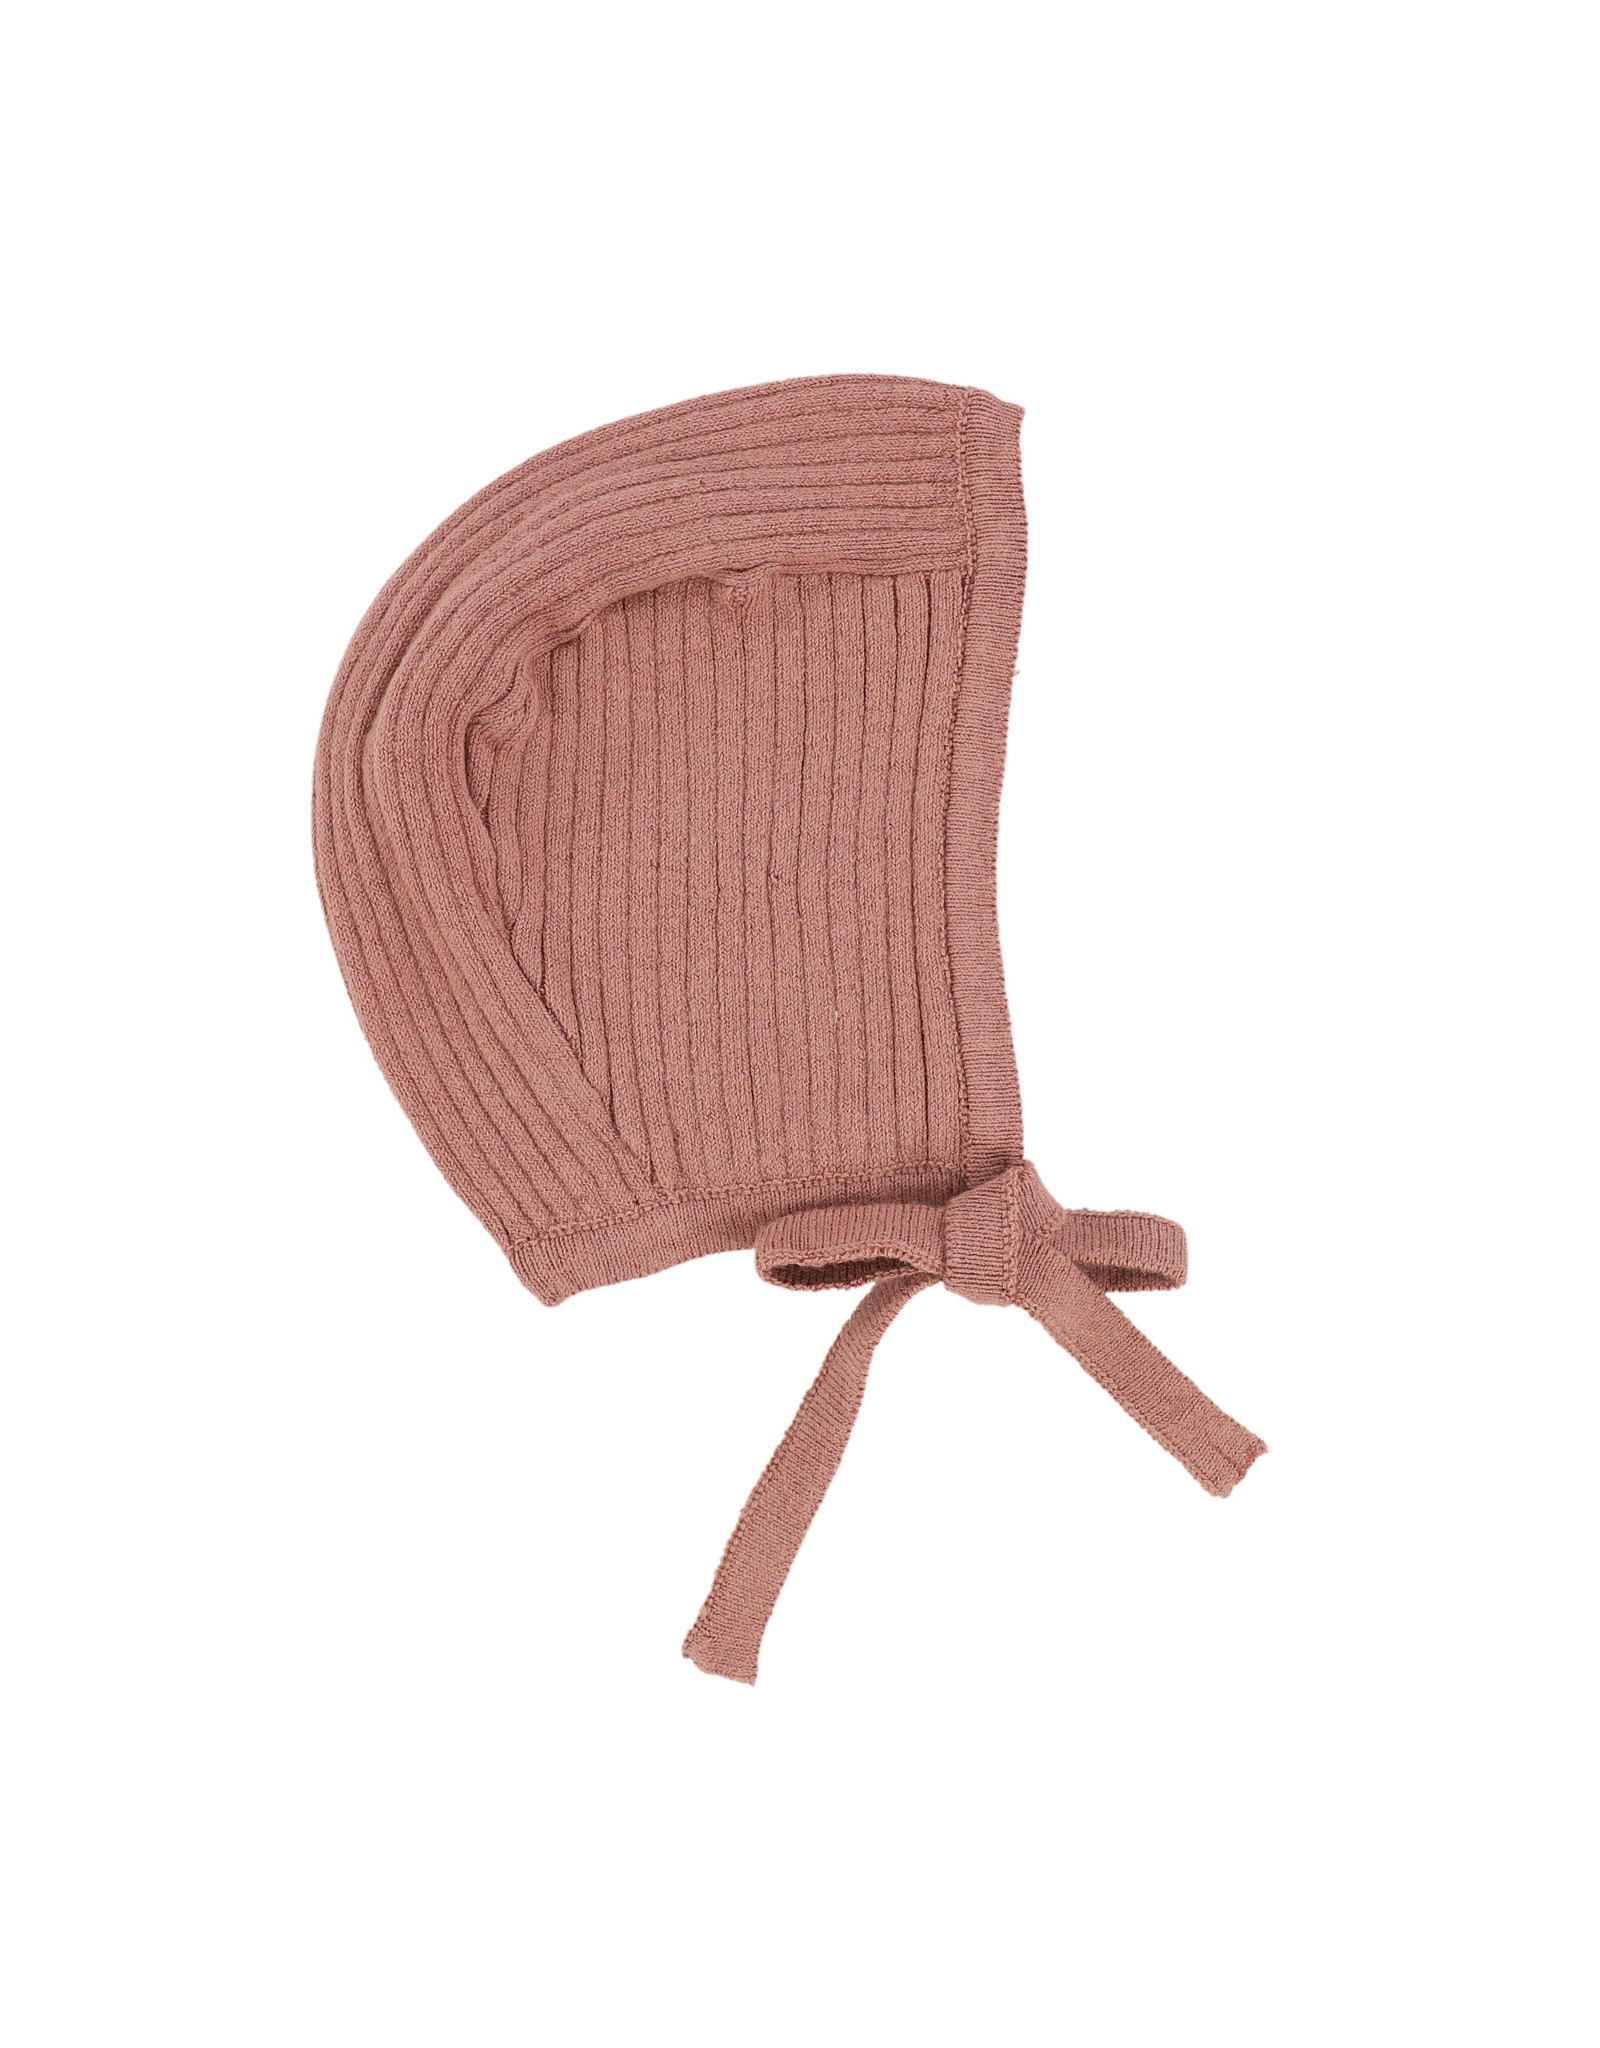 Analogie Analogie Knit Bonnet